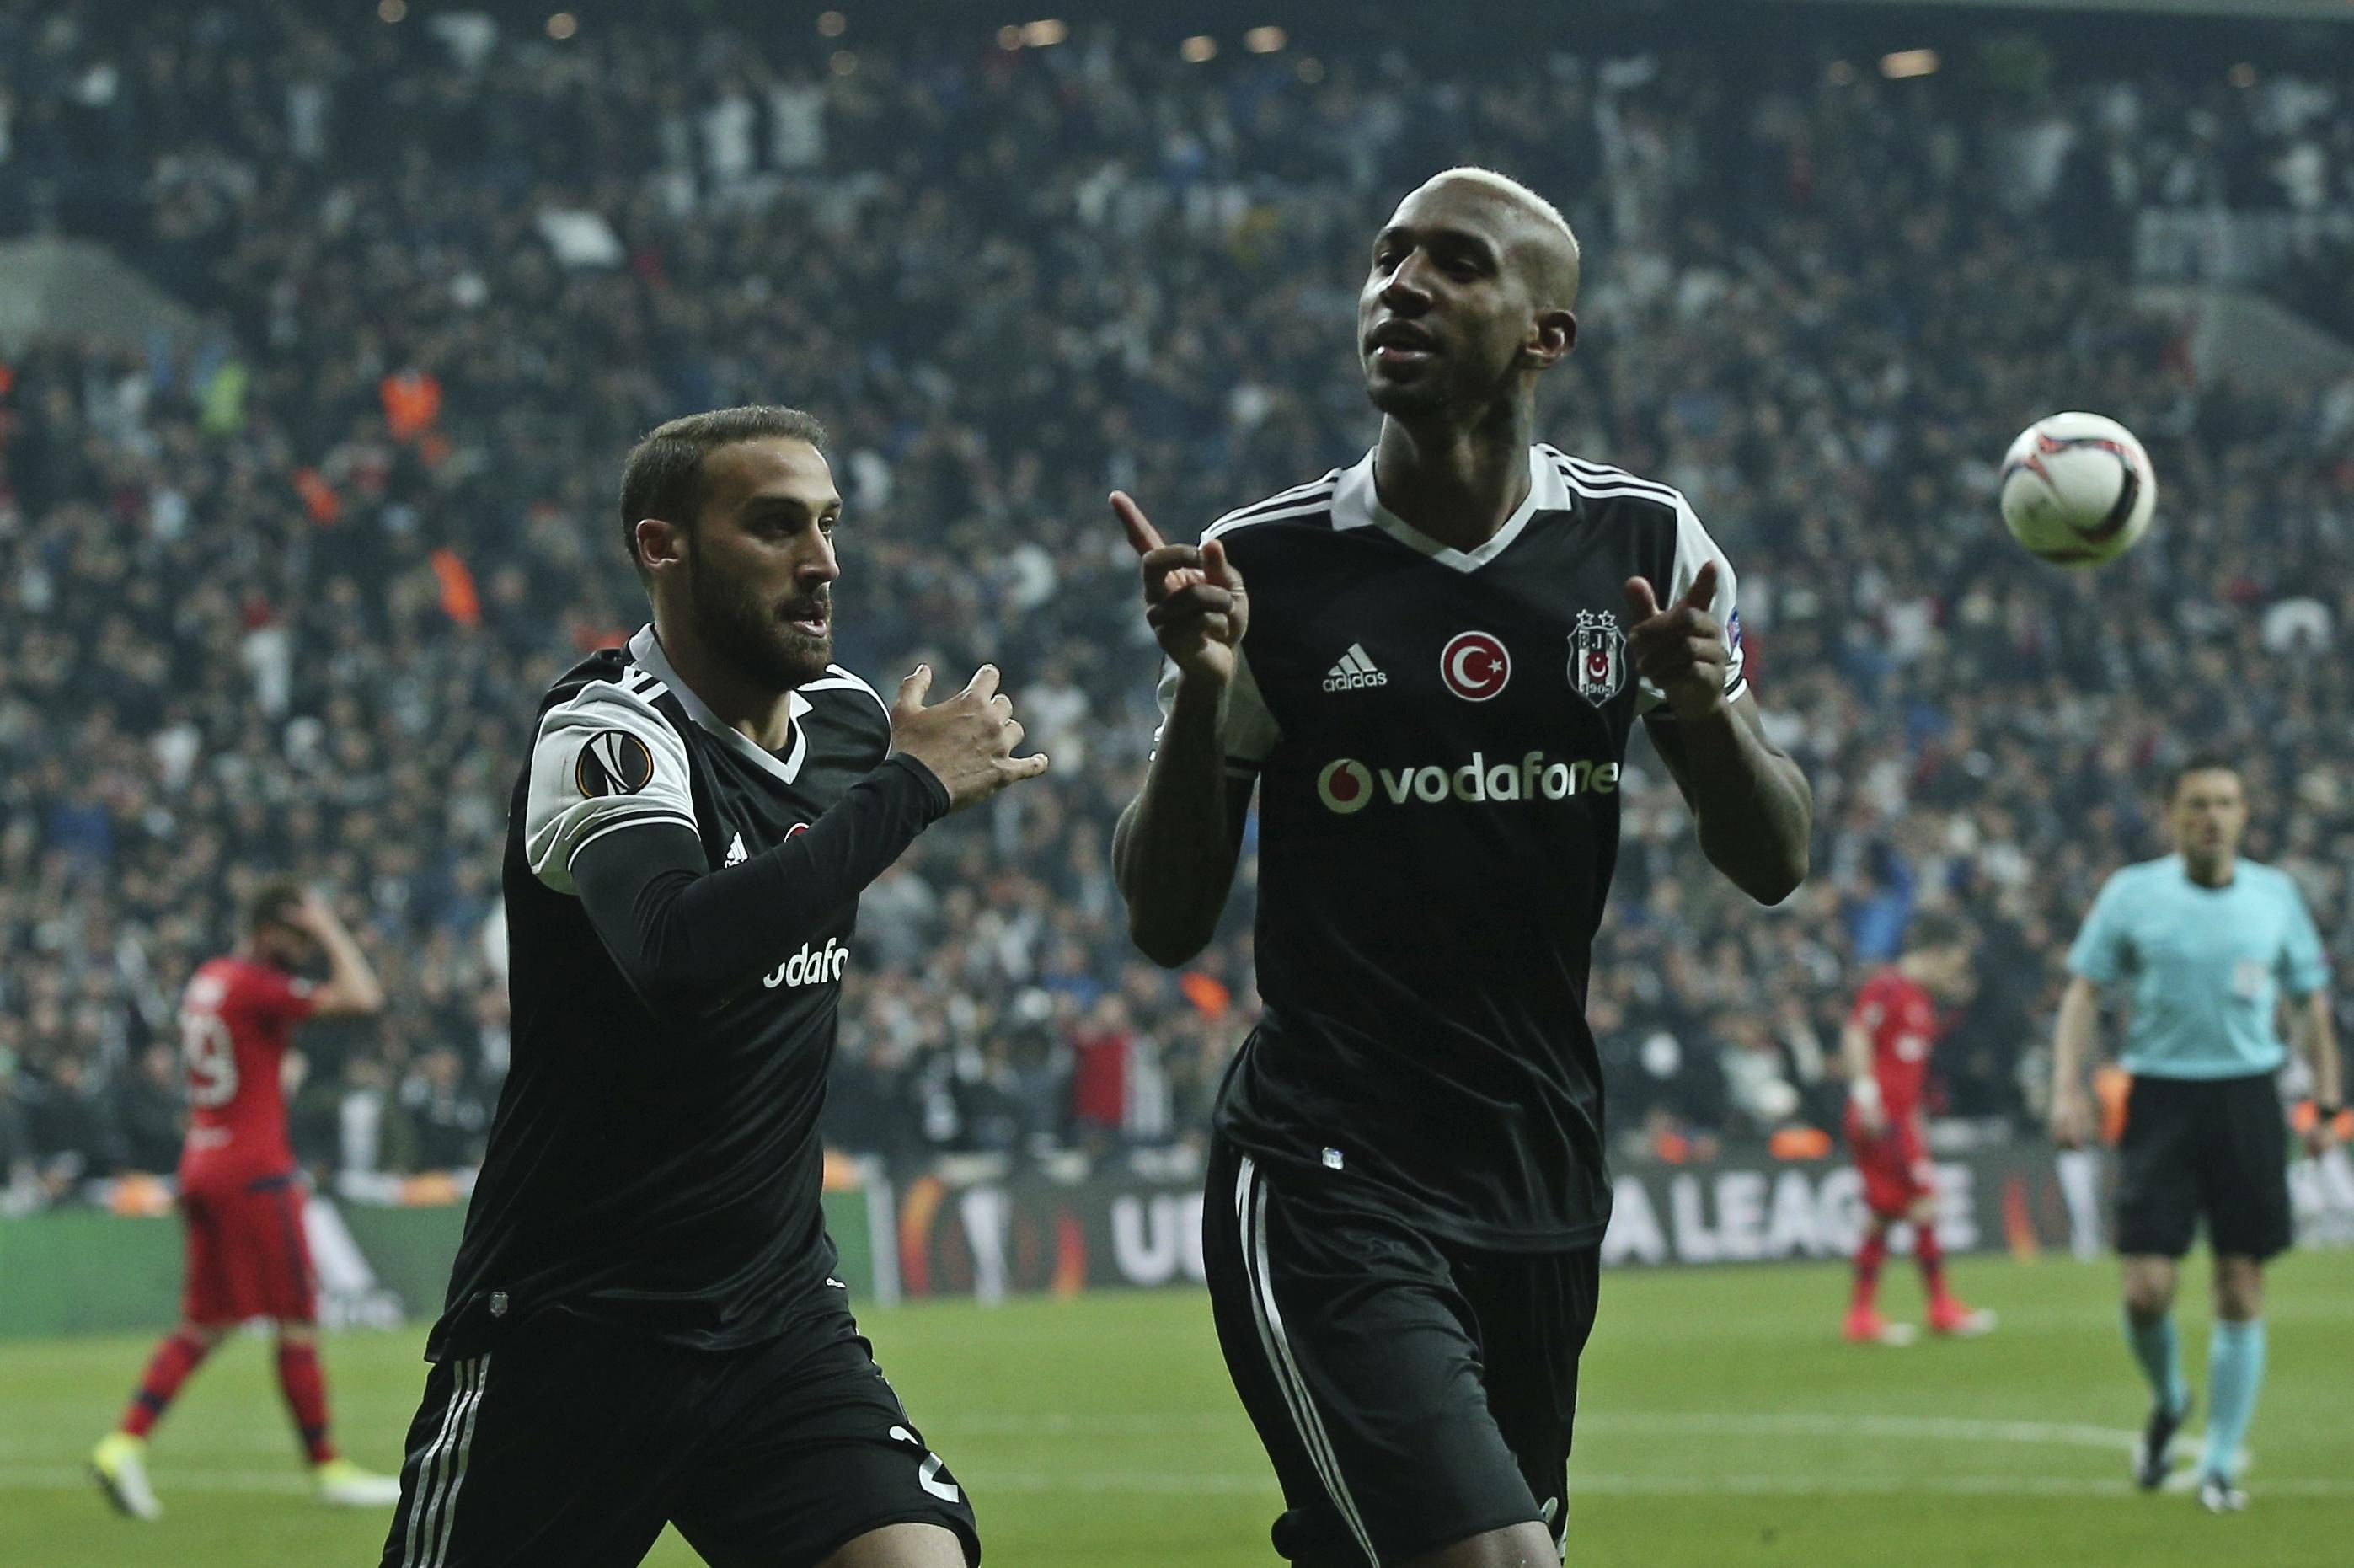 Besiktas got to the Europa League quarter-finals last season